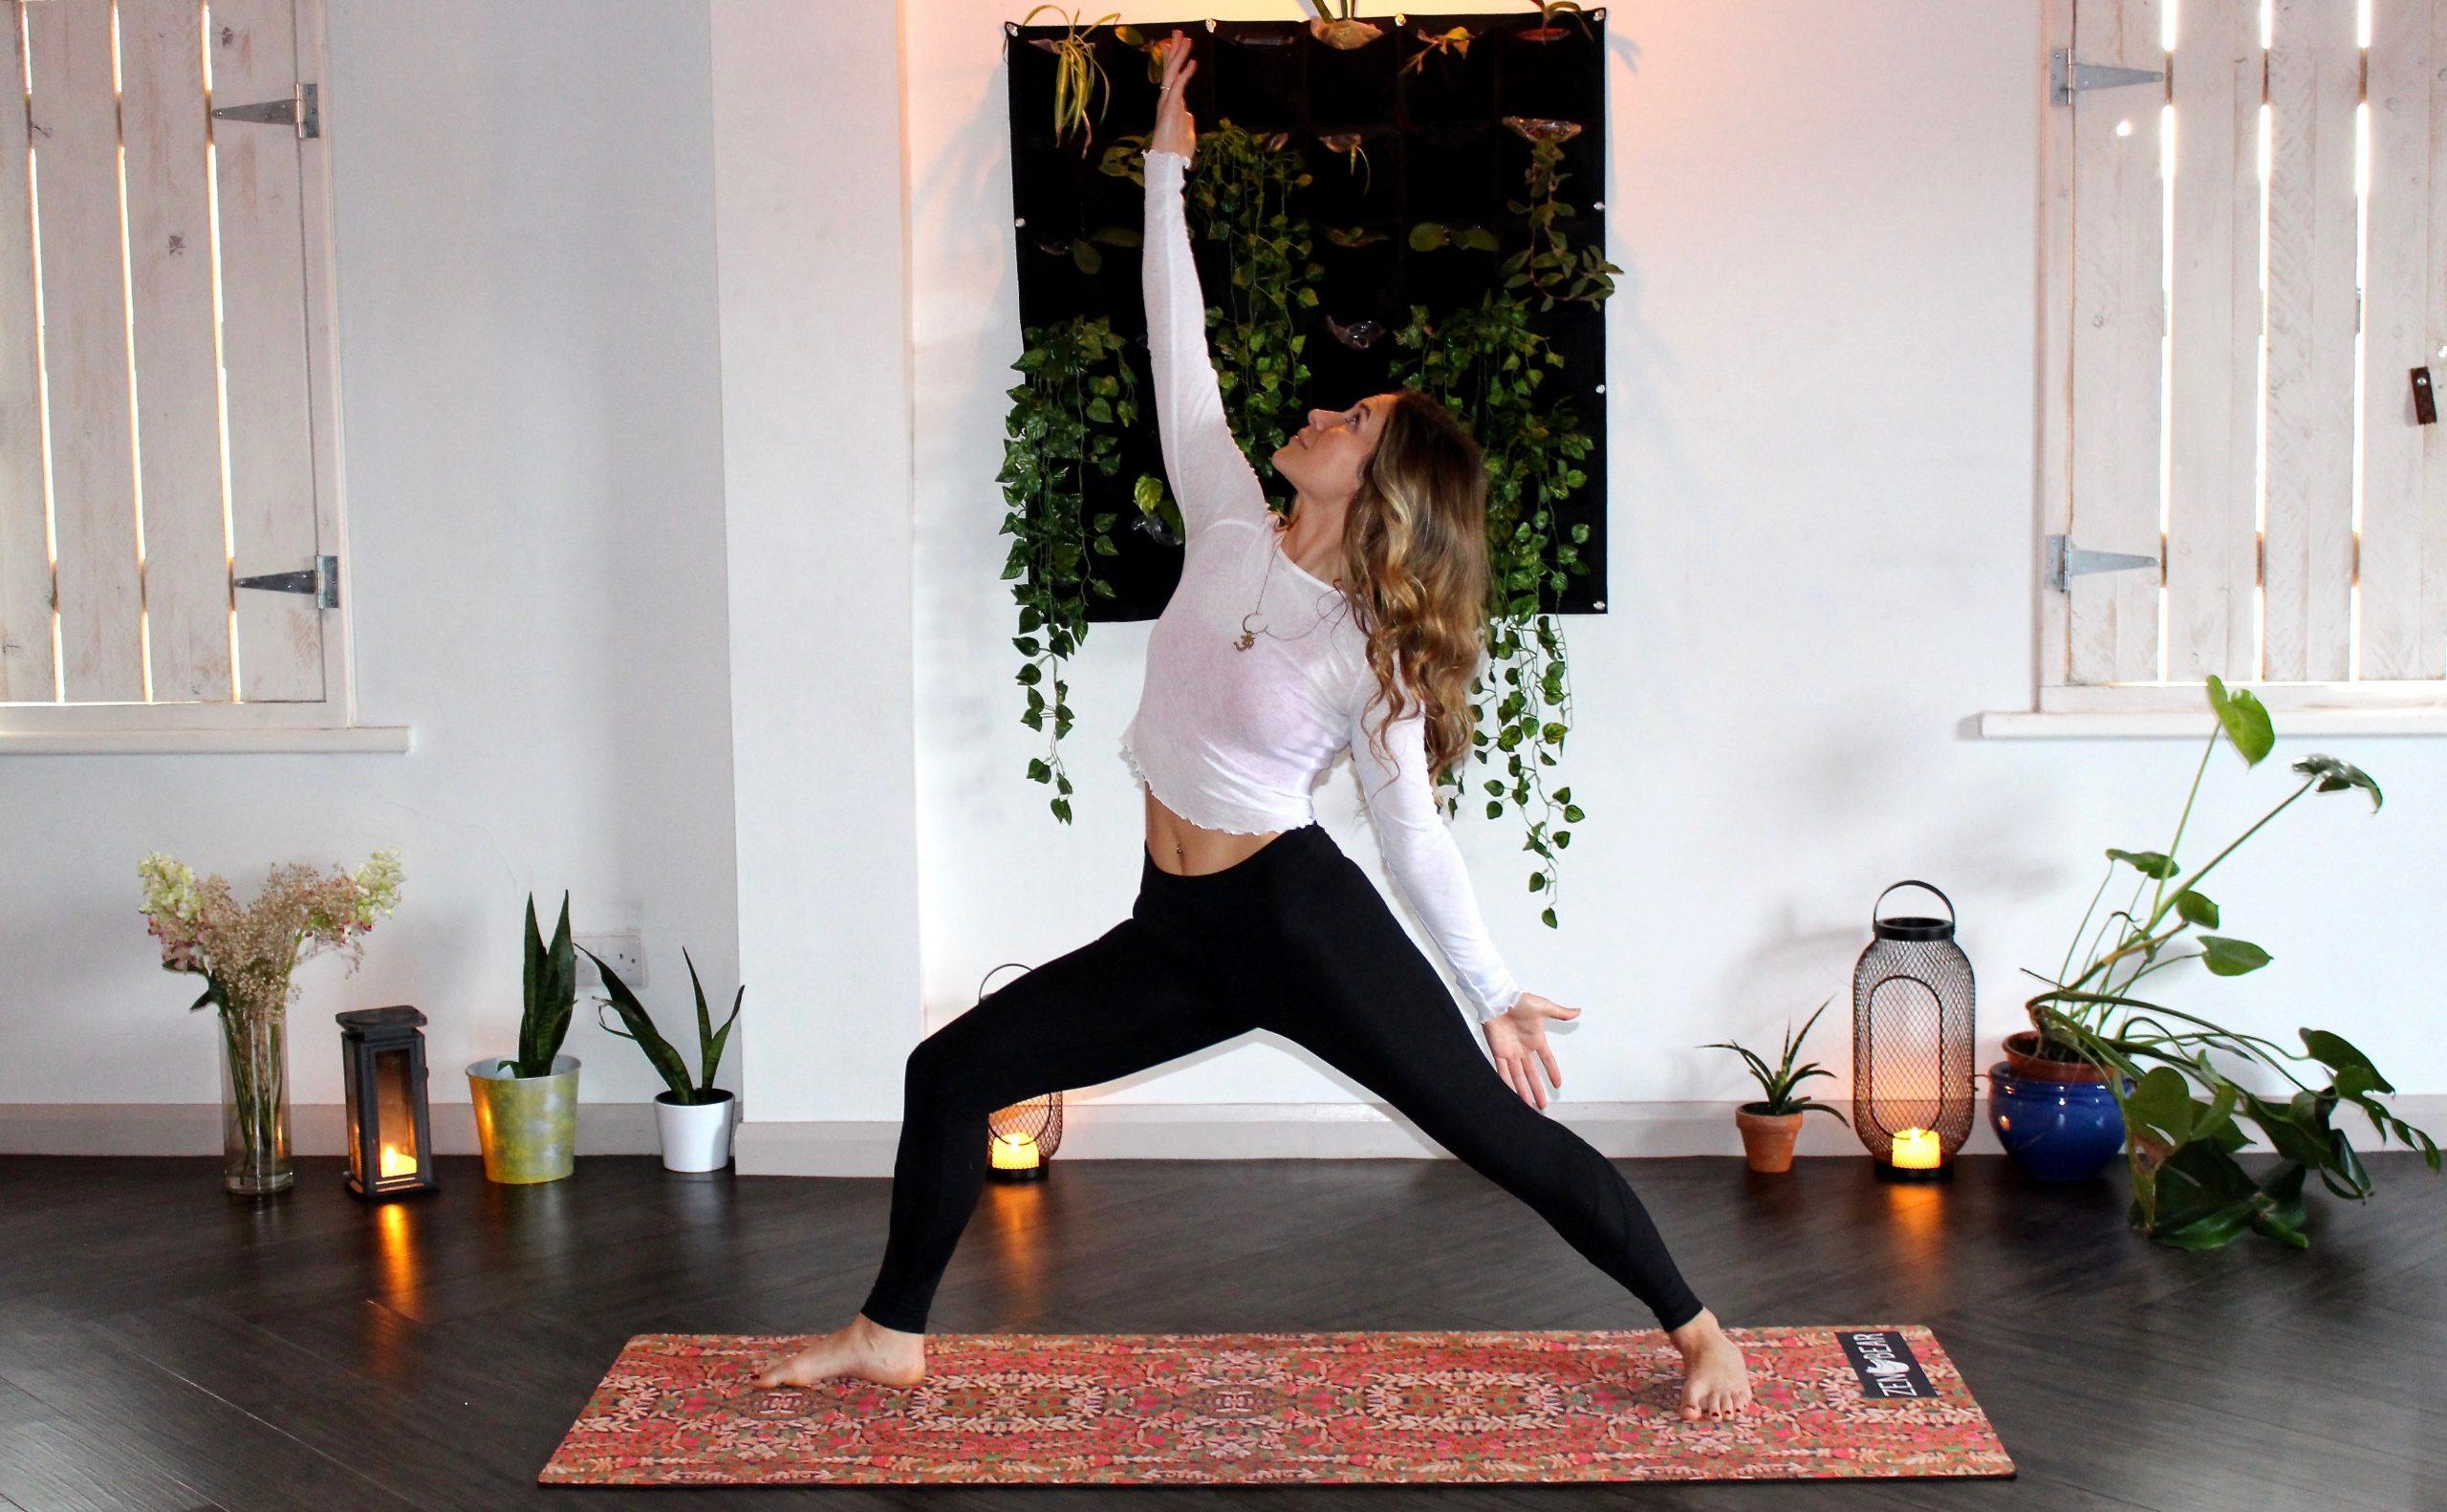 Yoga in Yoga Studio on a Zen Bear Yoga Mat